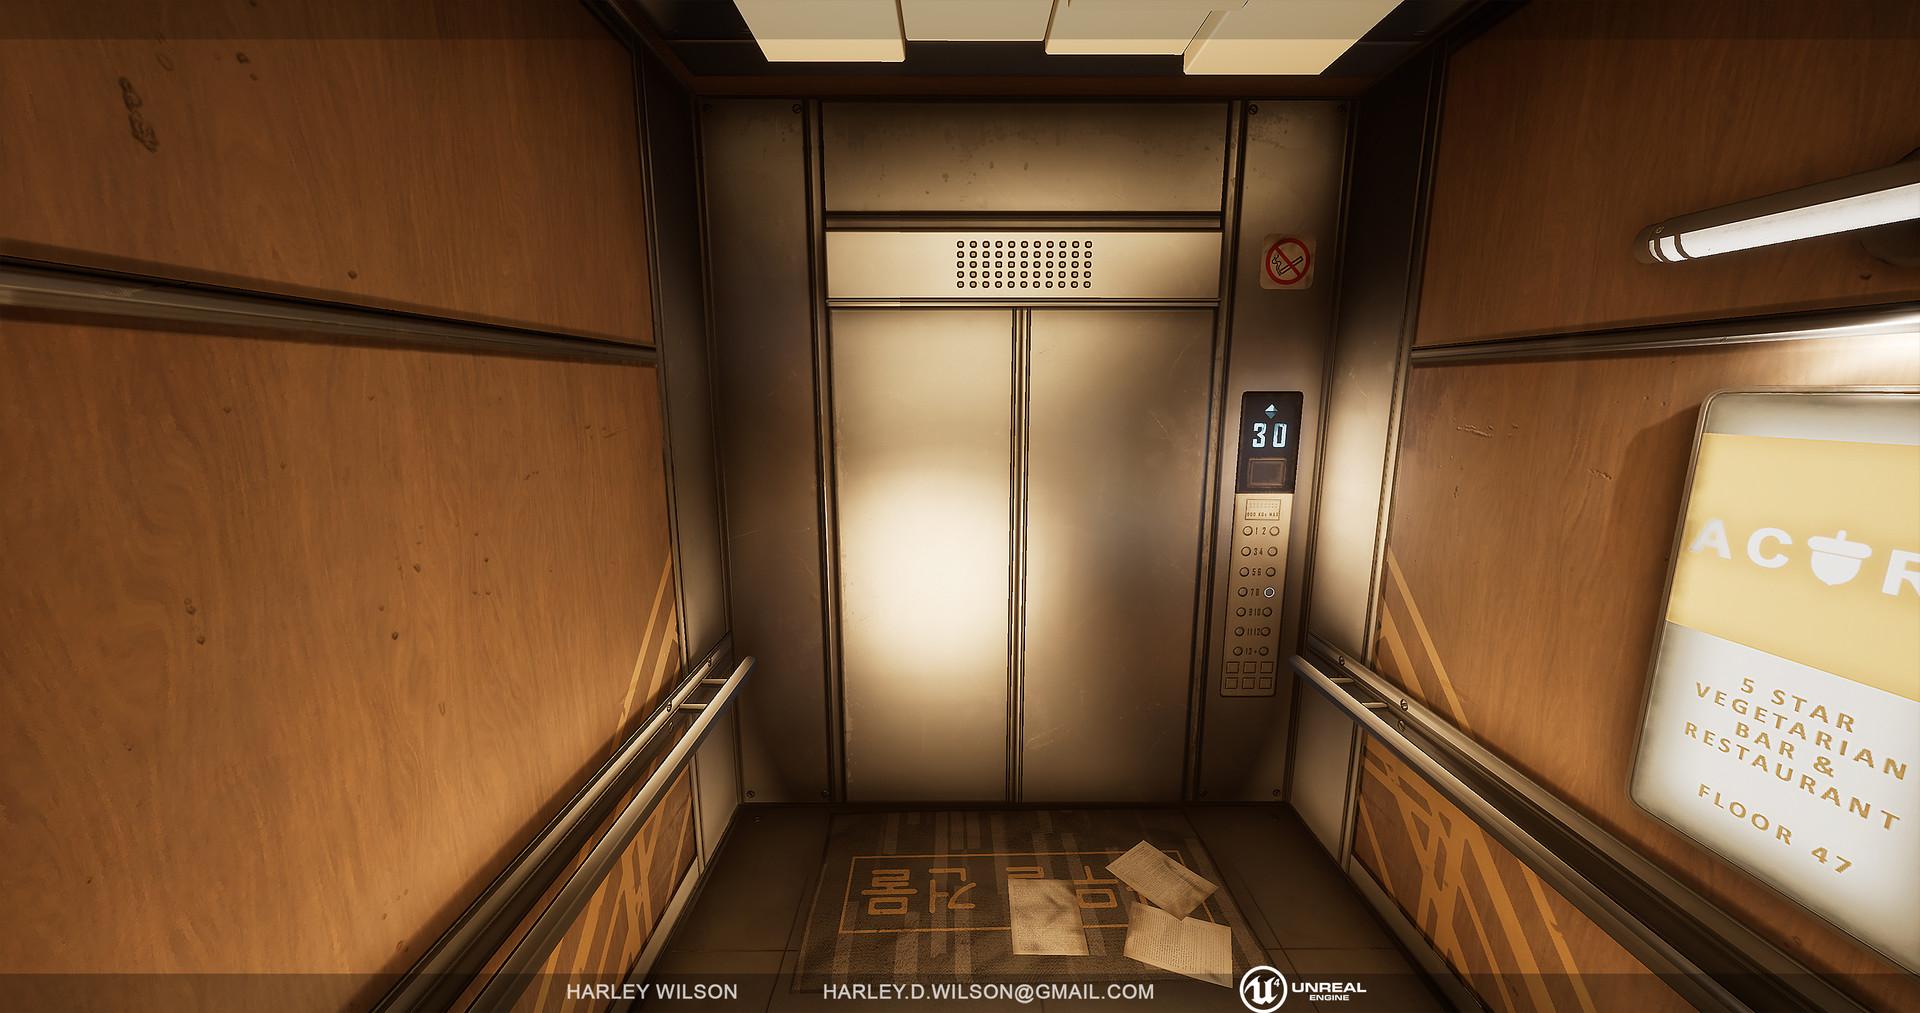 Harley wilson elevator c